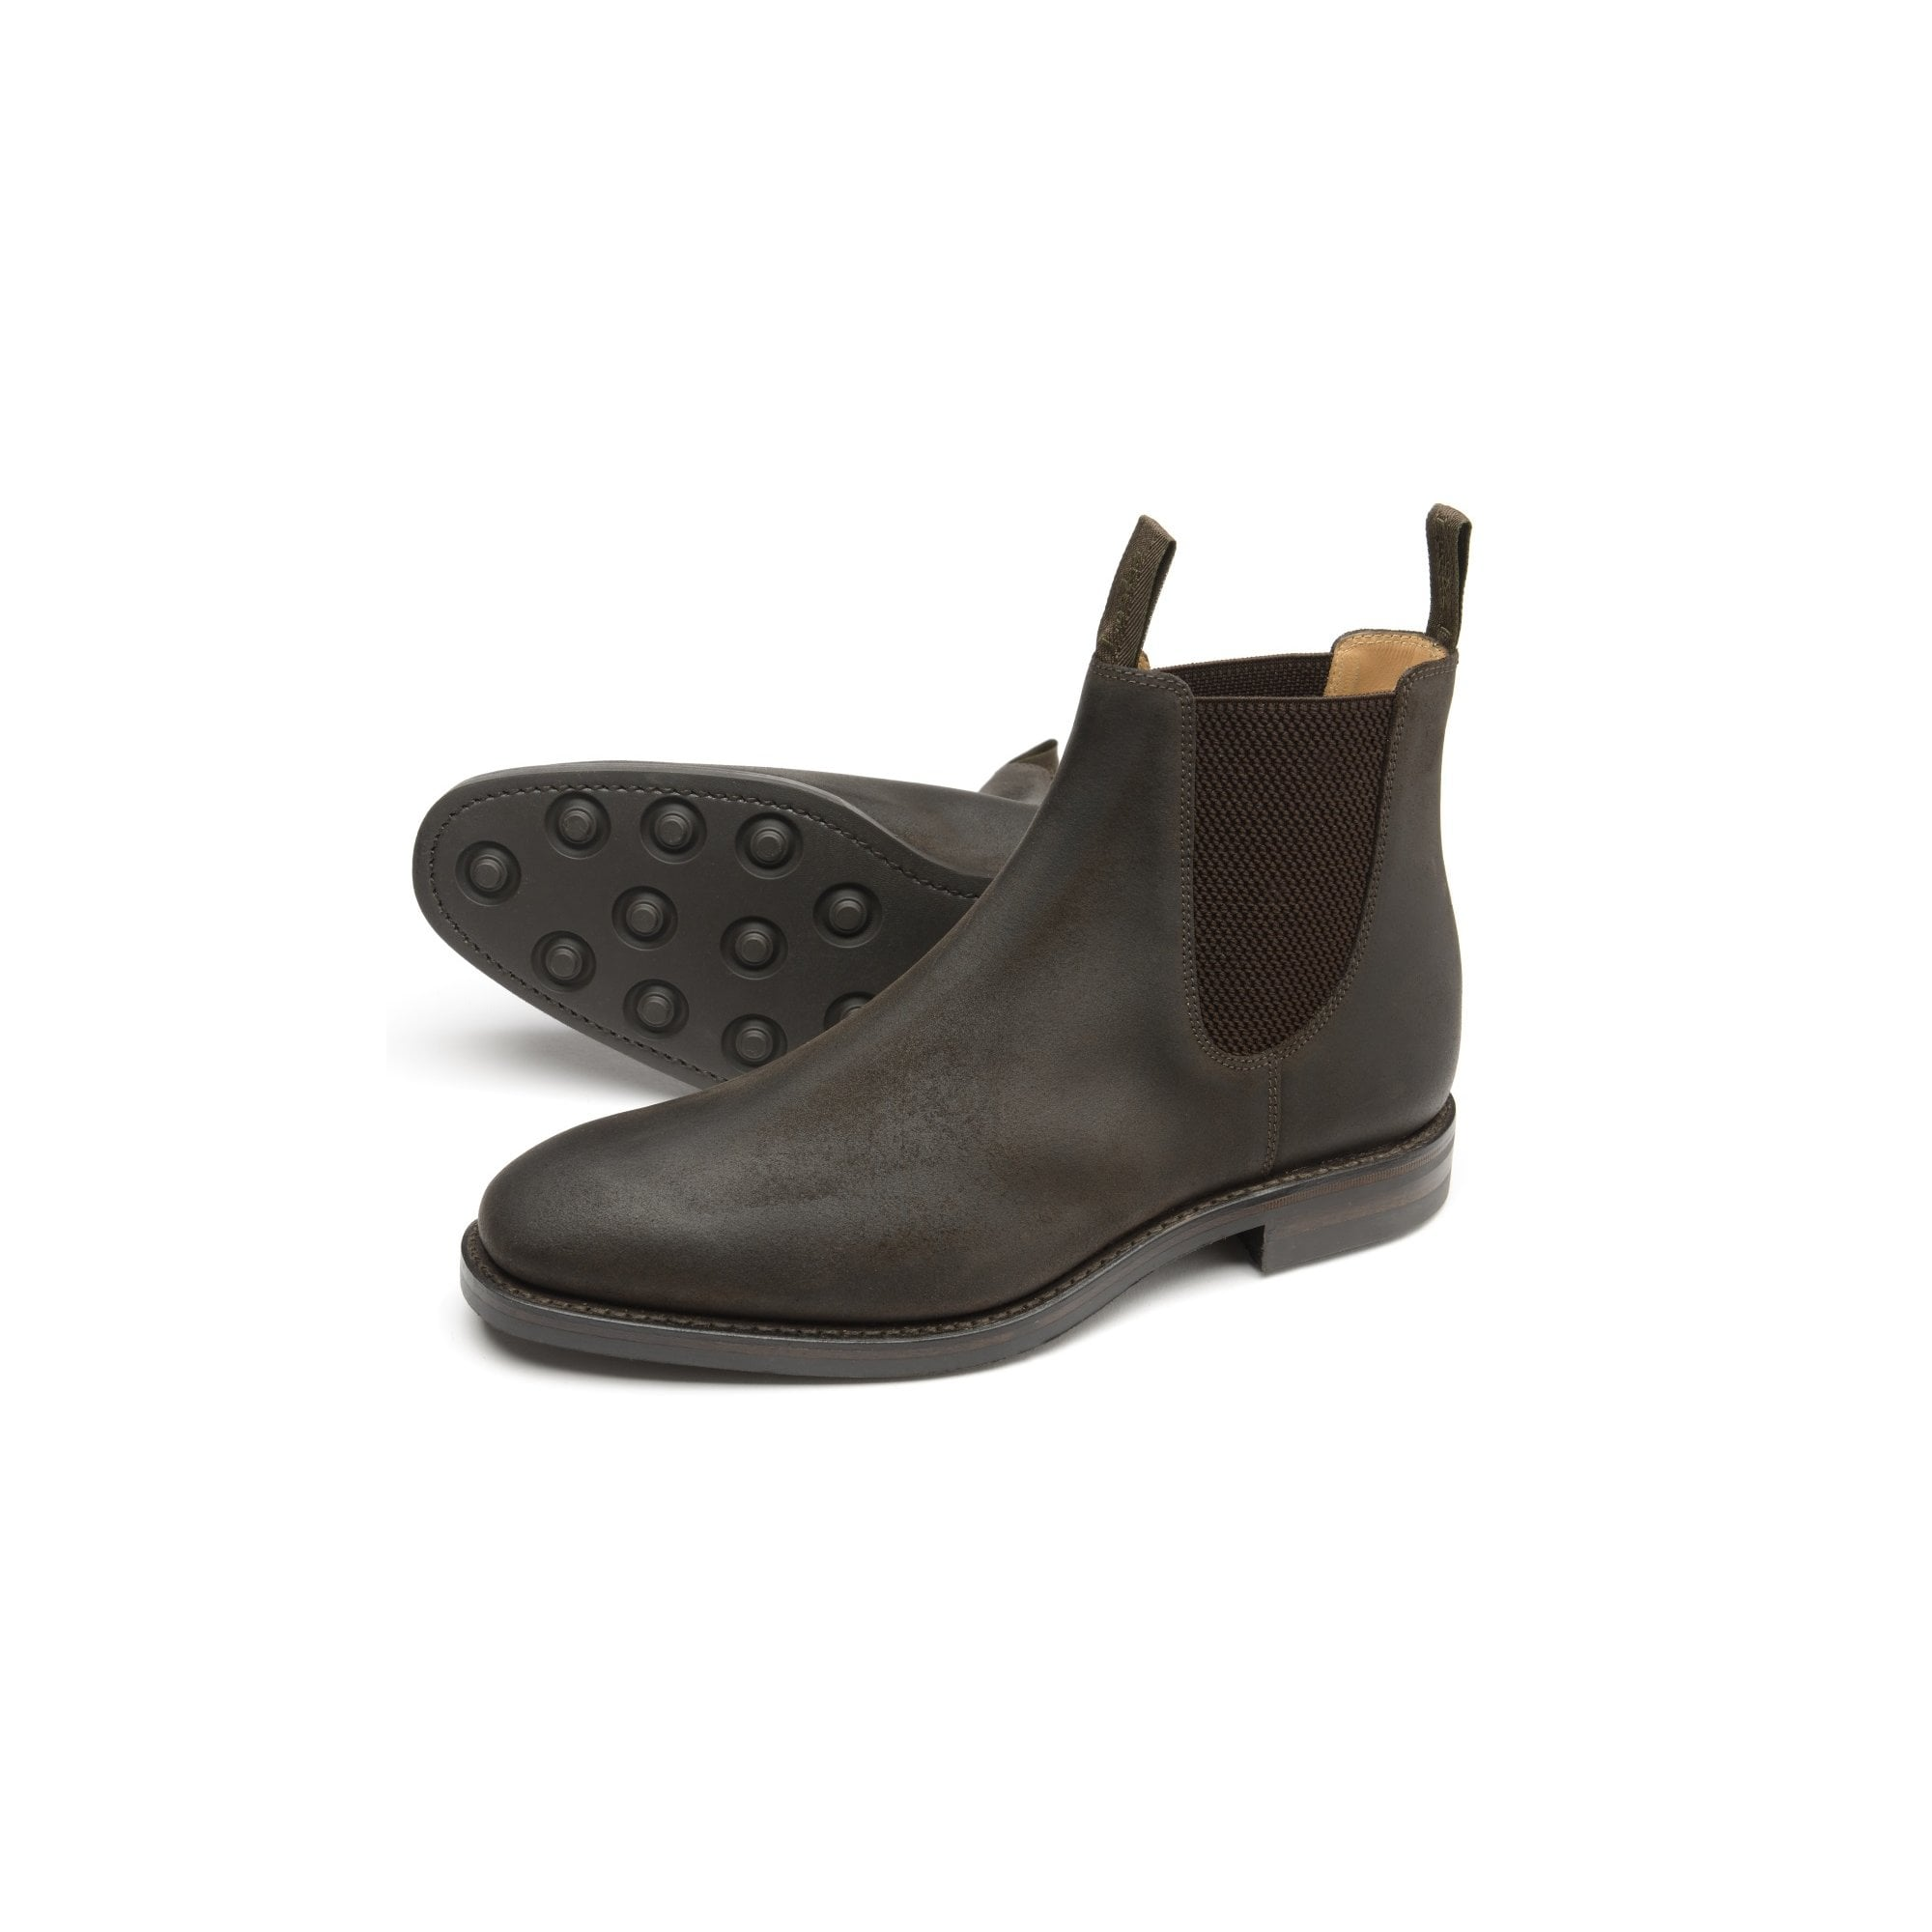 9f79e996530 Chatterley Waxy Chelsea Boot in Tan